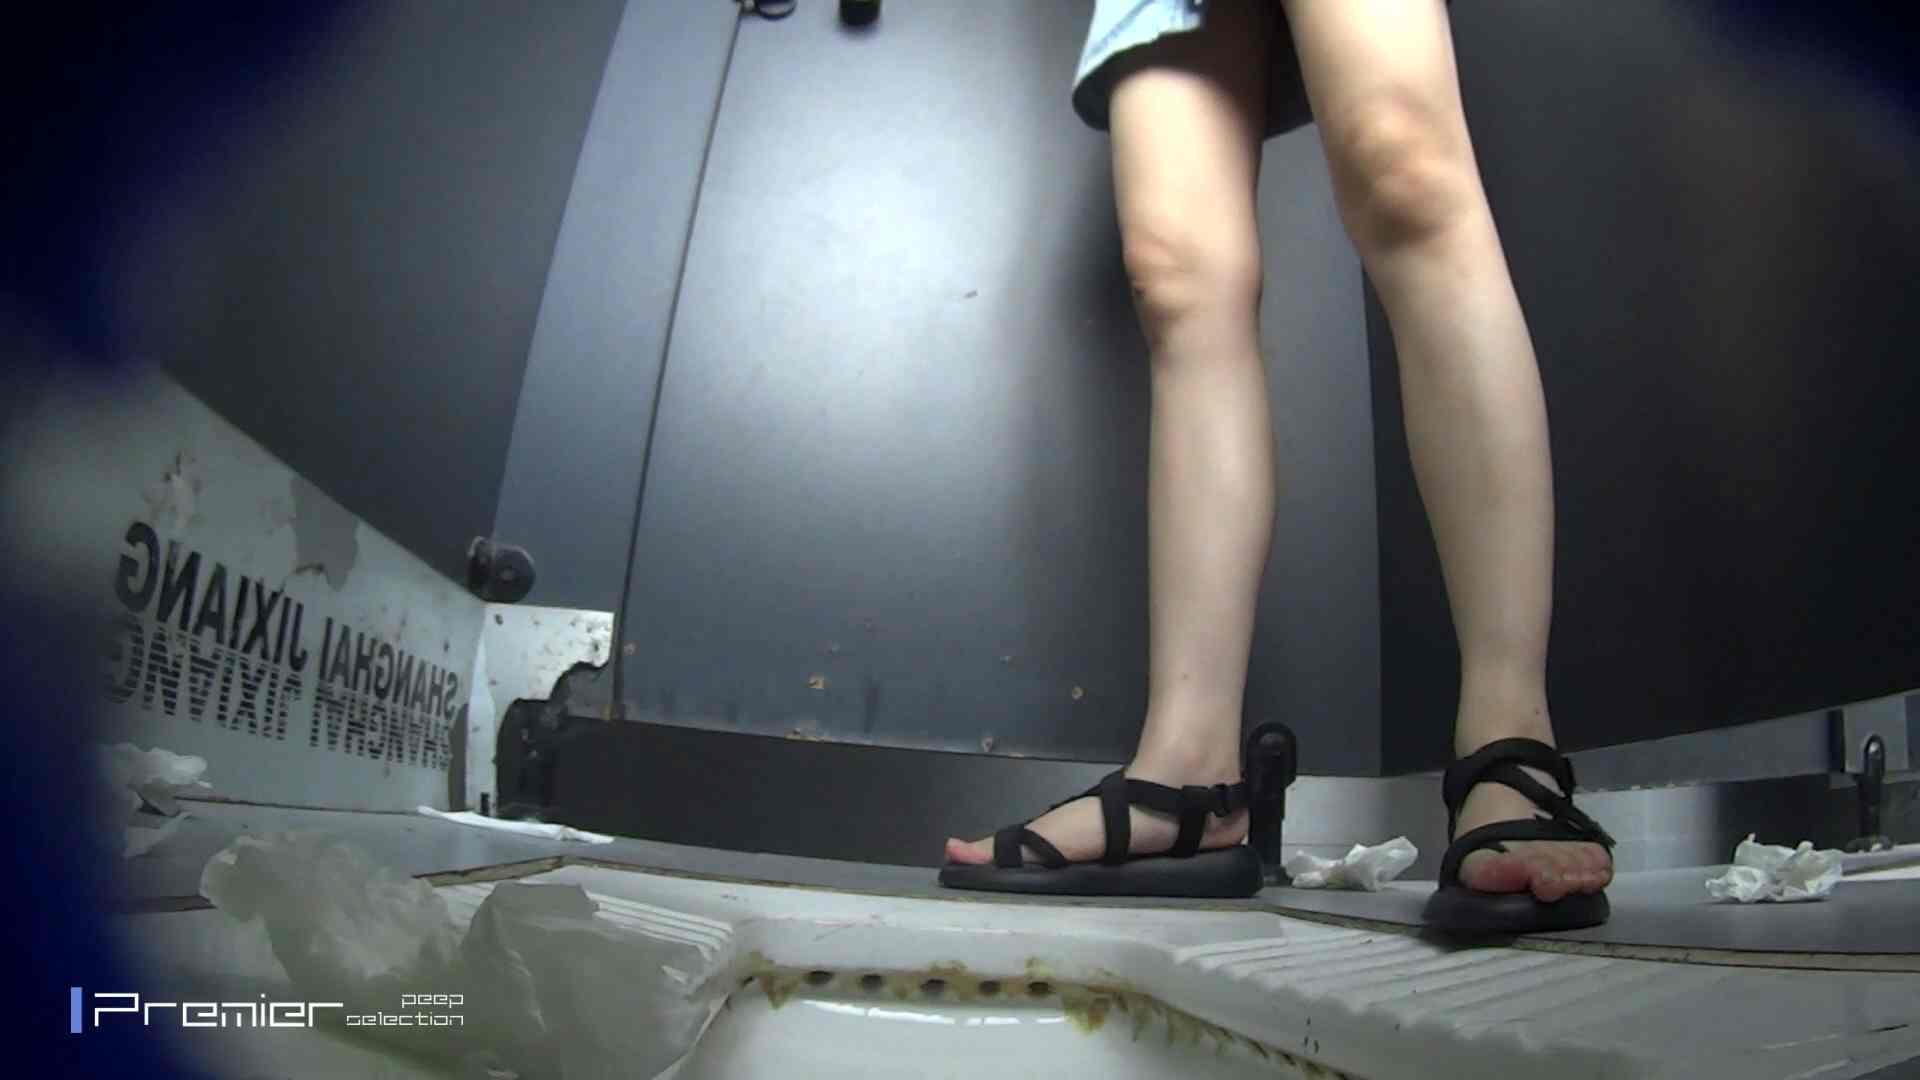 聖水ダラダラ色美女の洗面所 大学休憩時間の洗面所事情55 高画質動画  107画像 99